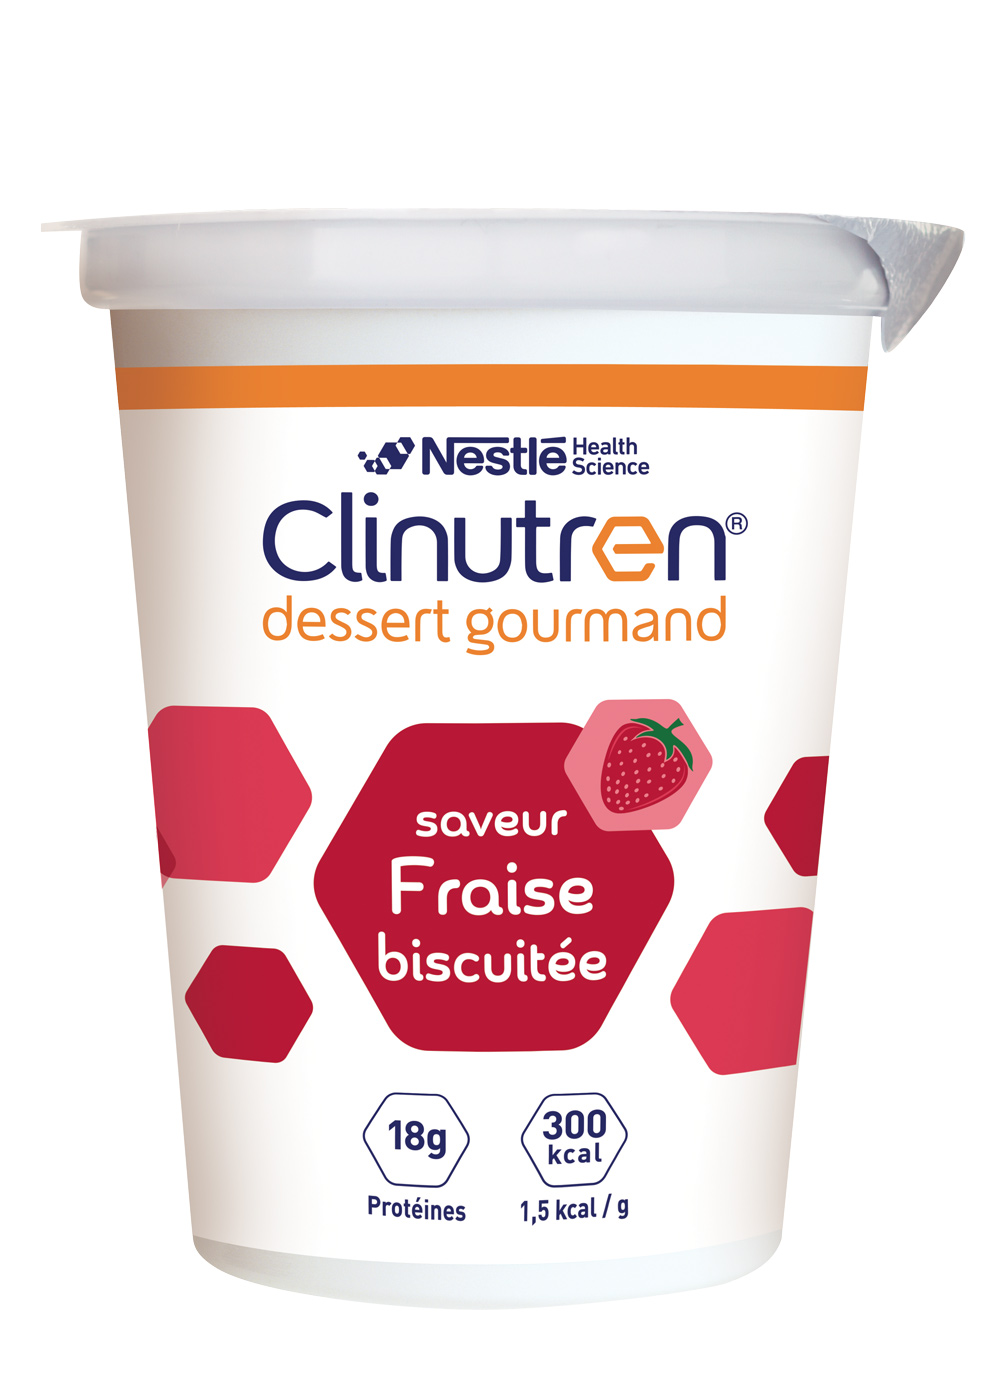 Clinutren Dessert Gourmand Fraise Biscuitee 4 X 200 G